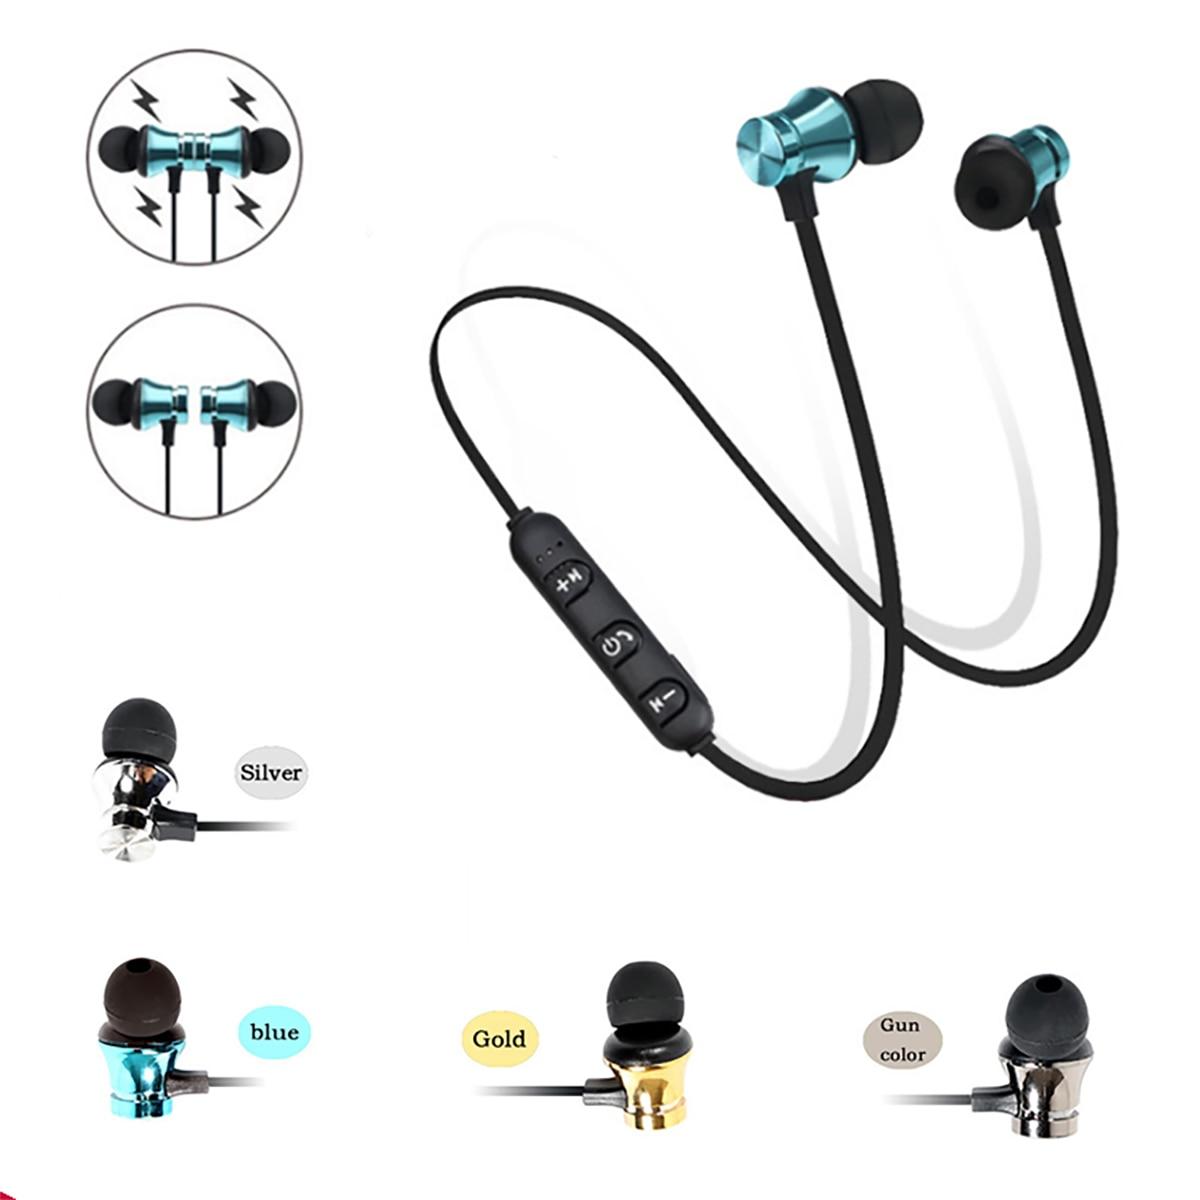 Bluetooth Earphone Sport Handsfree <font><b>Headphones</b></font> Wireless Earphones Magnetic Headset With Microphone For Mobile Phones Xiaomi